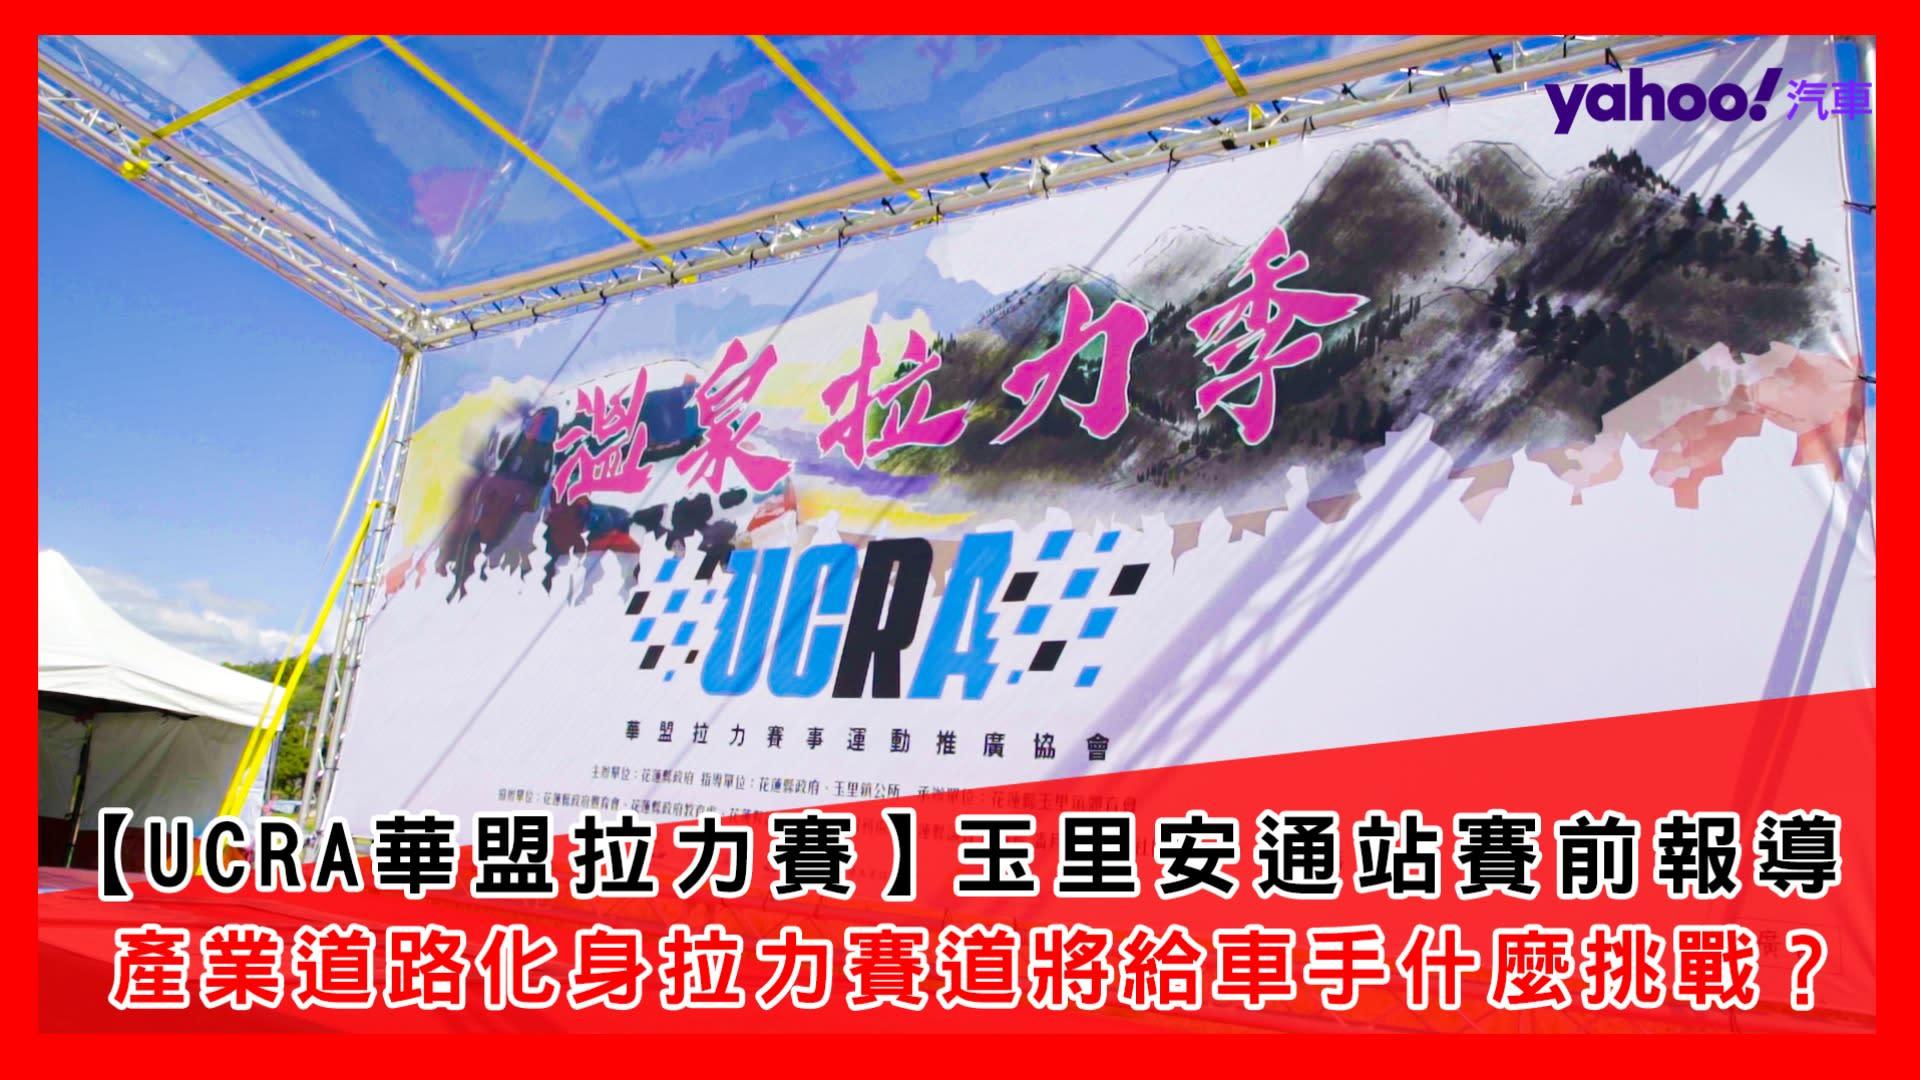 【2020 UCRA華盟拉力賽】花蓮玉里安通站賽前報導:產業道路化身拉力賽道!